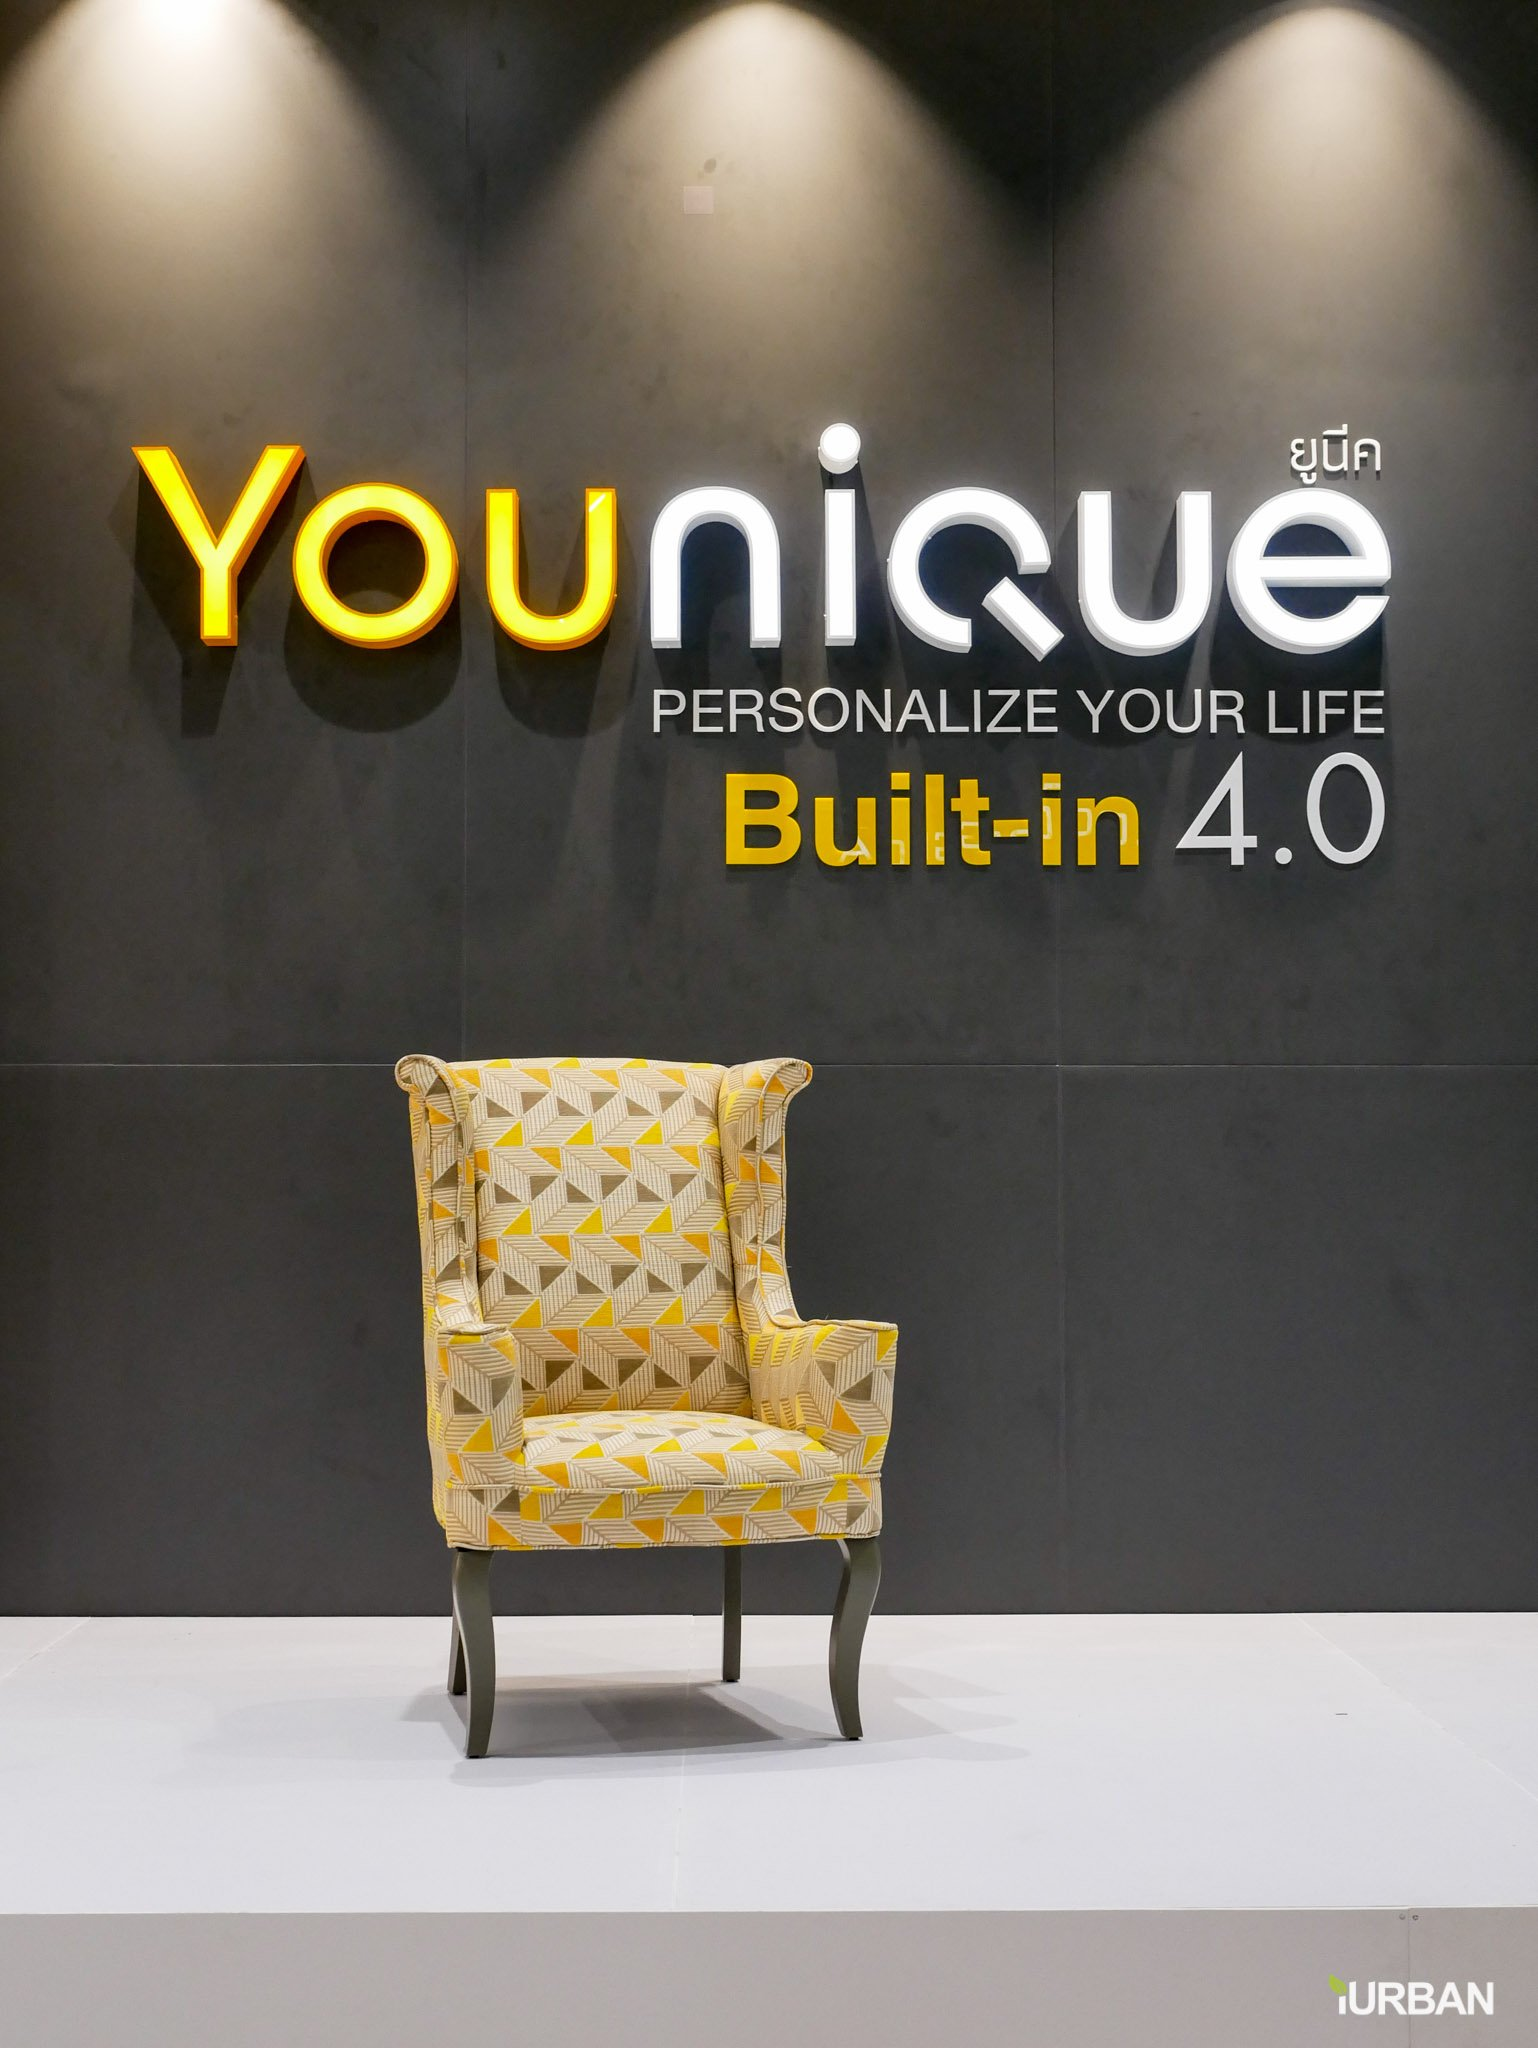 Younique เทคโนโลยีบิวท์อิน 4.0 ครั้งแรกในไทย มีเป็นล้านดีไซน์ รู้ราคาใน 1 นาที โดย Index Livingmall 47 - Built-in